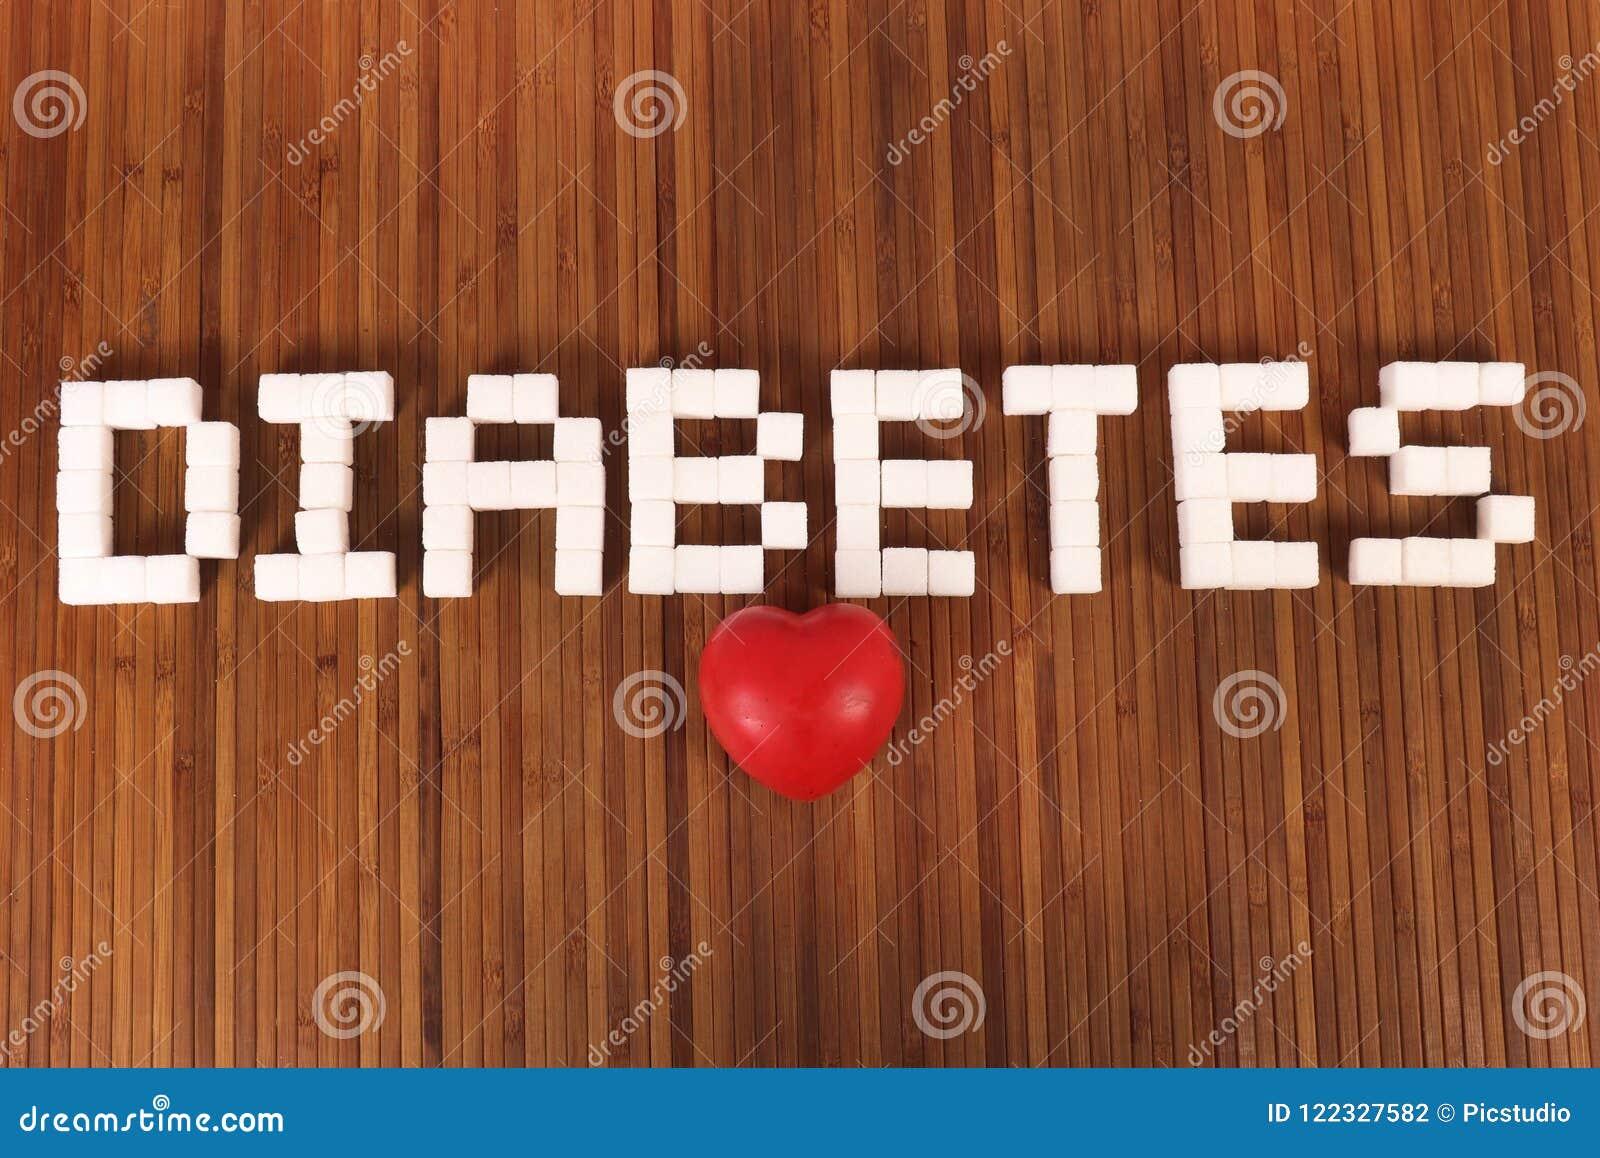 Cukier i cukrzyce